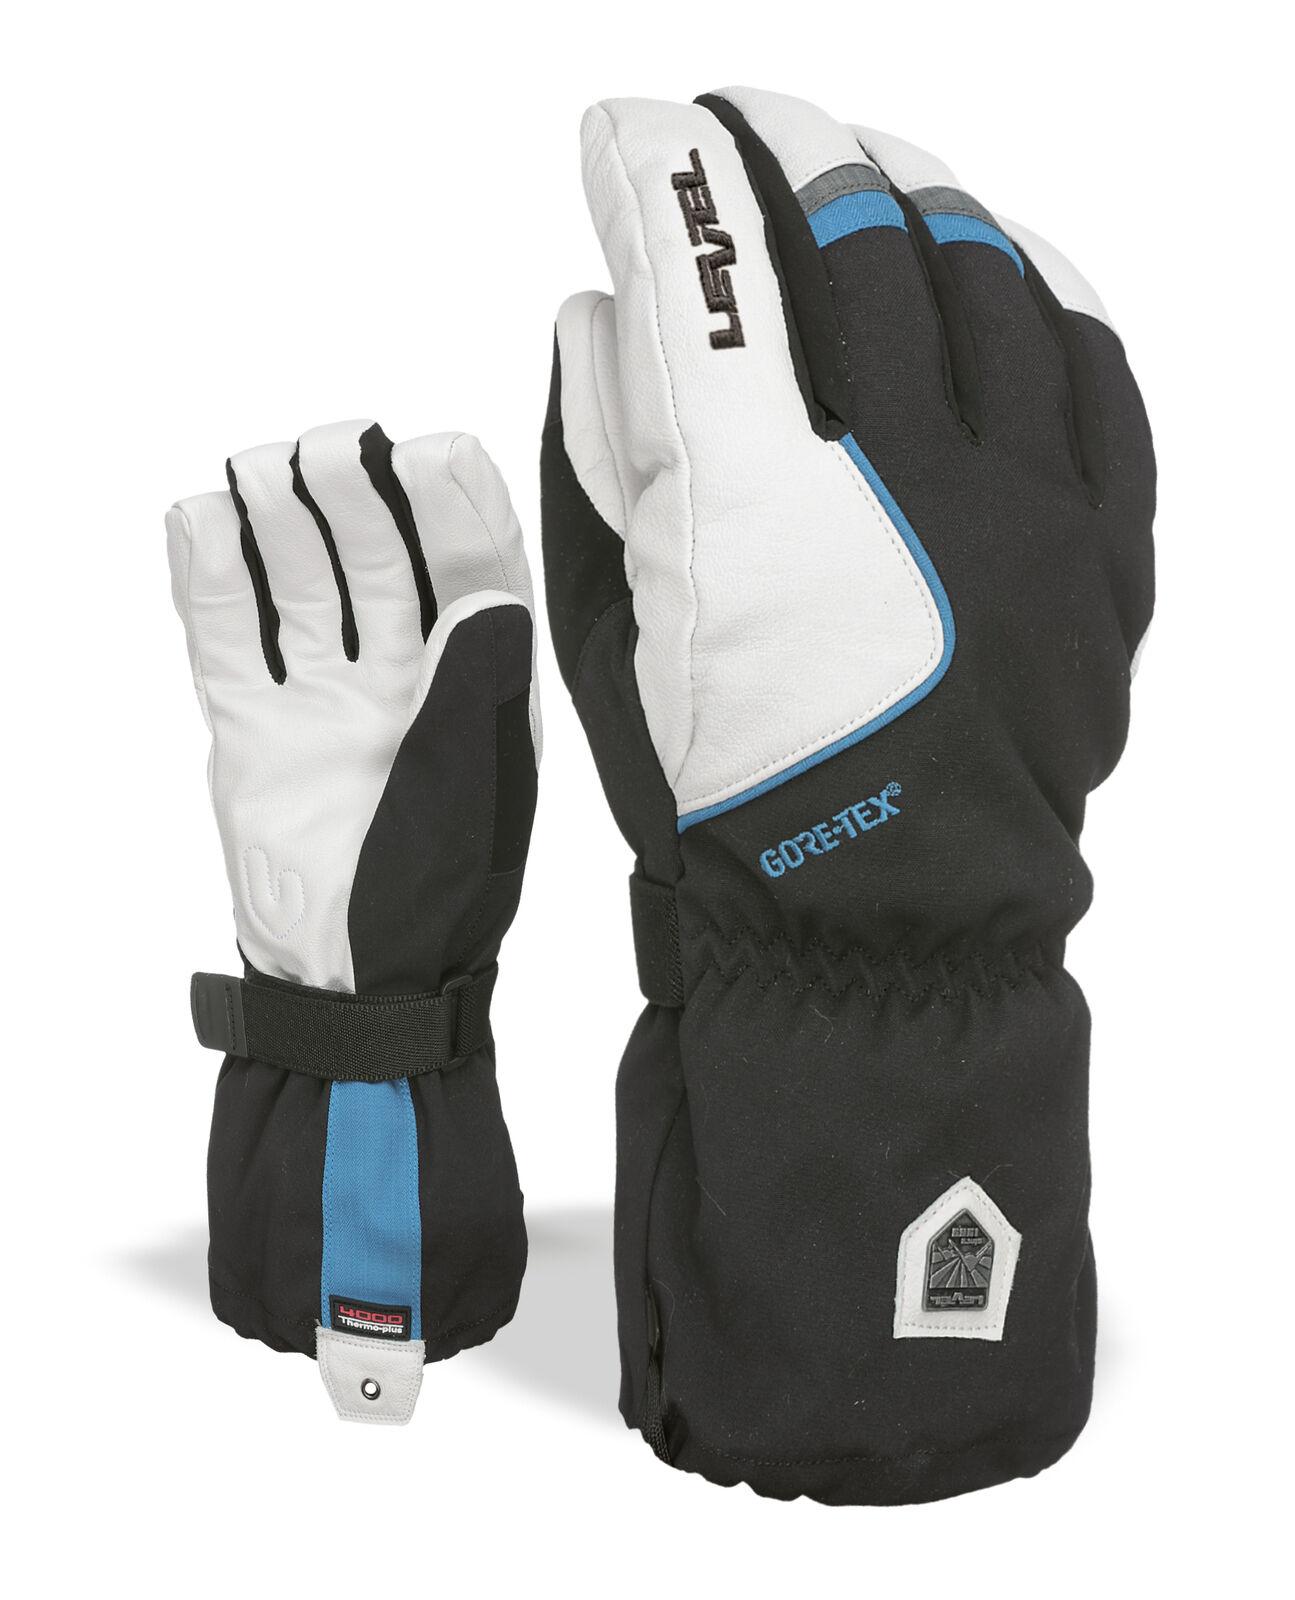 Level Handschuh Heli Gore-Tex black  winddicht wasserdicht wärmend  fishional store for sale